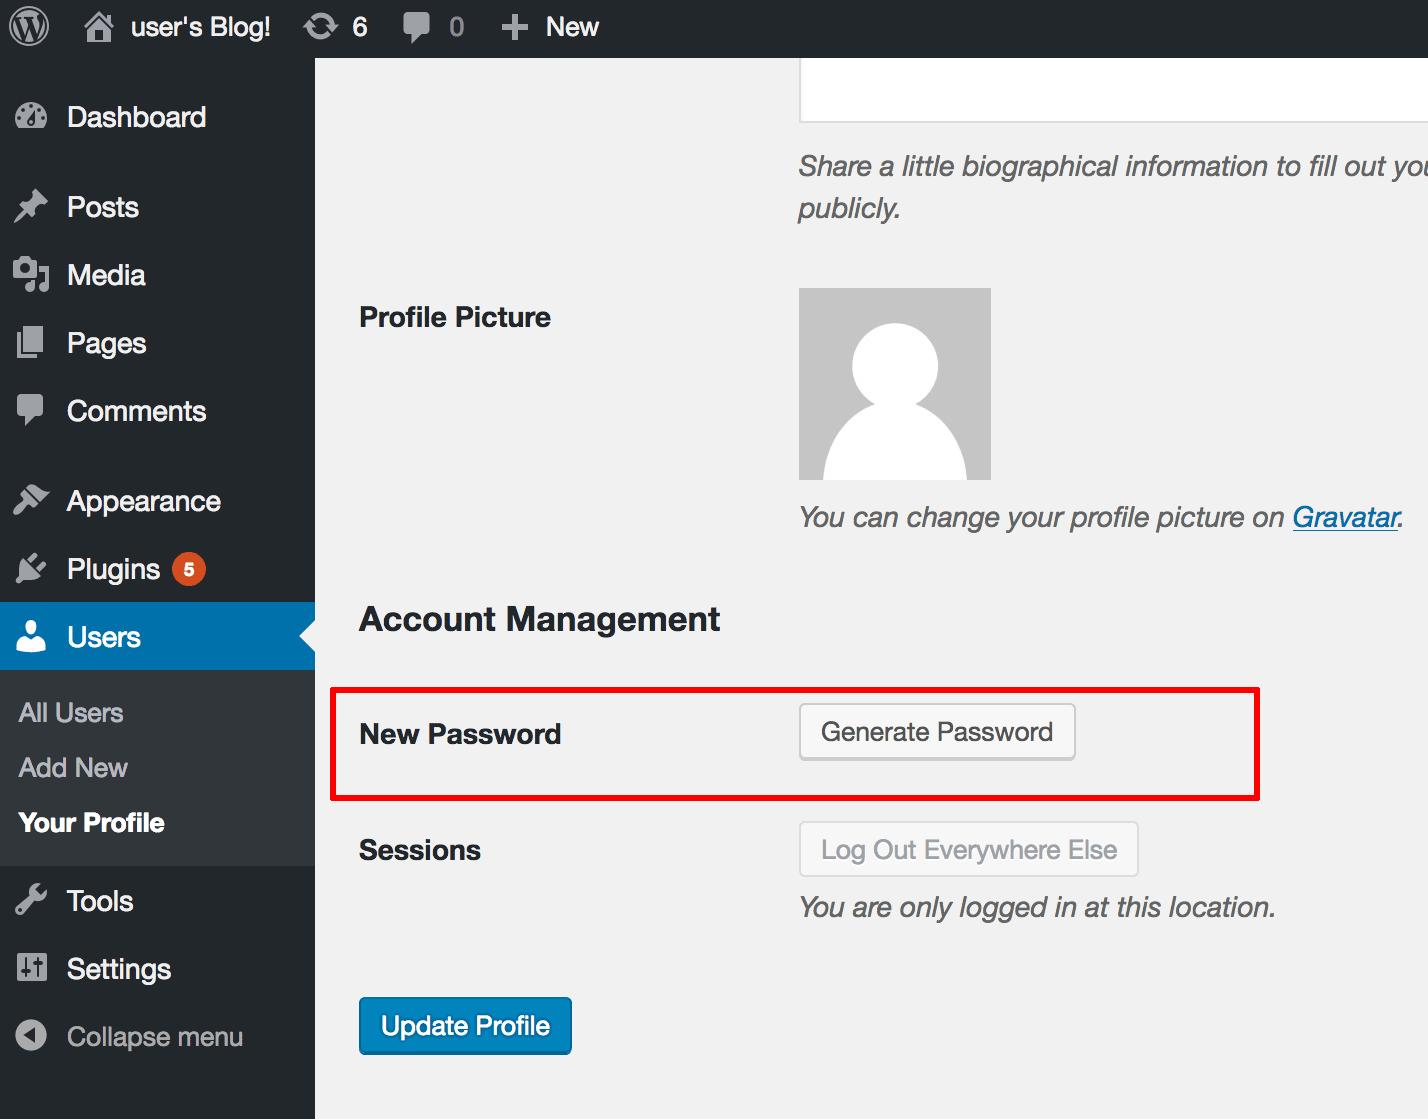 Password generation